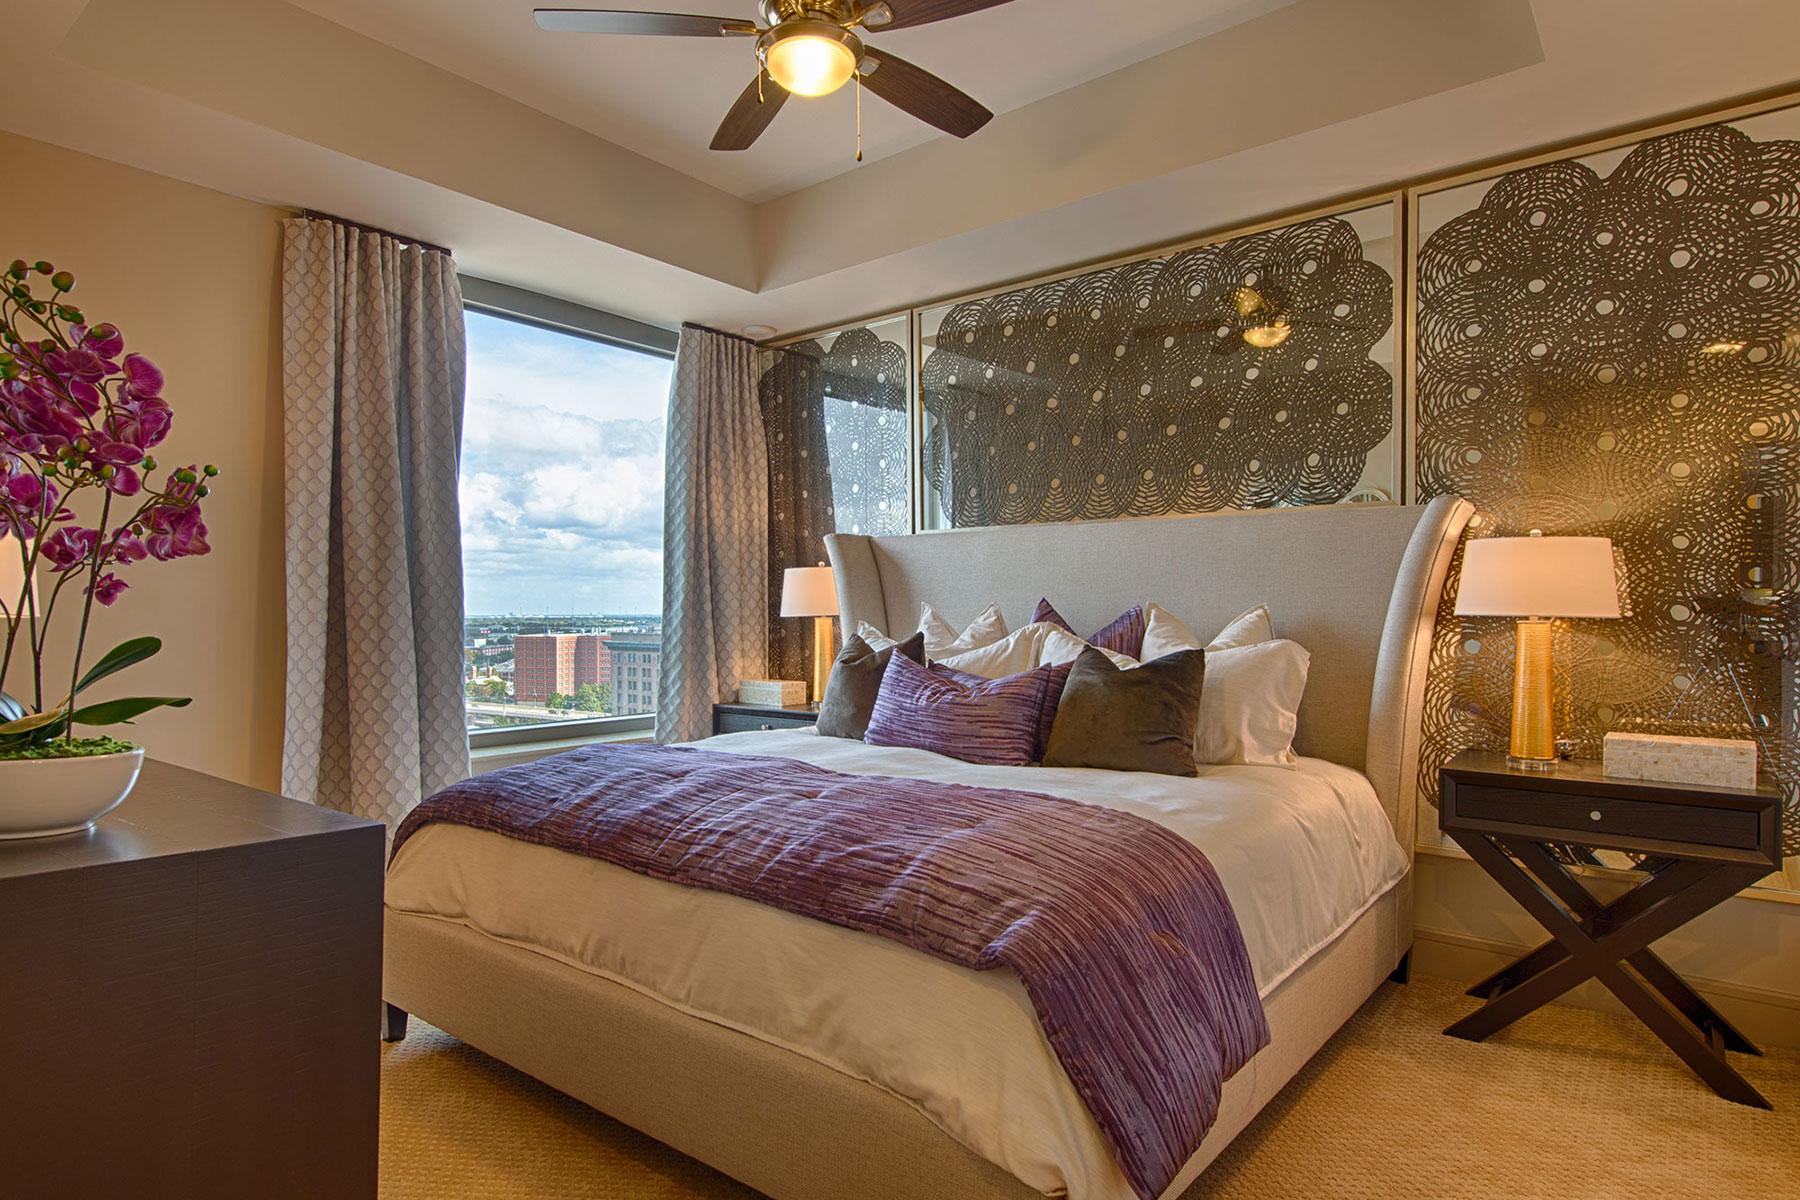 MST 1 BDRM Luxury Bedroom